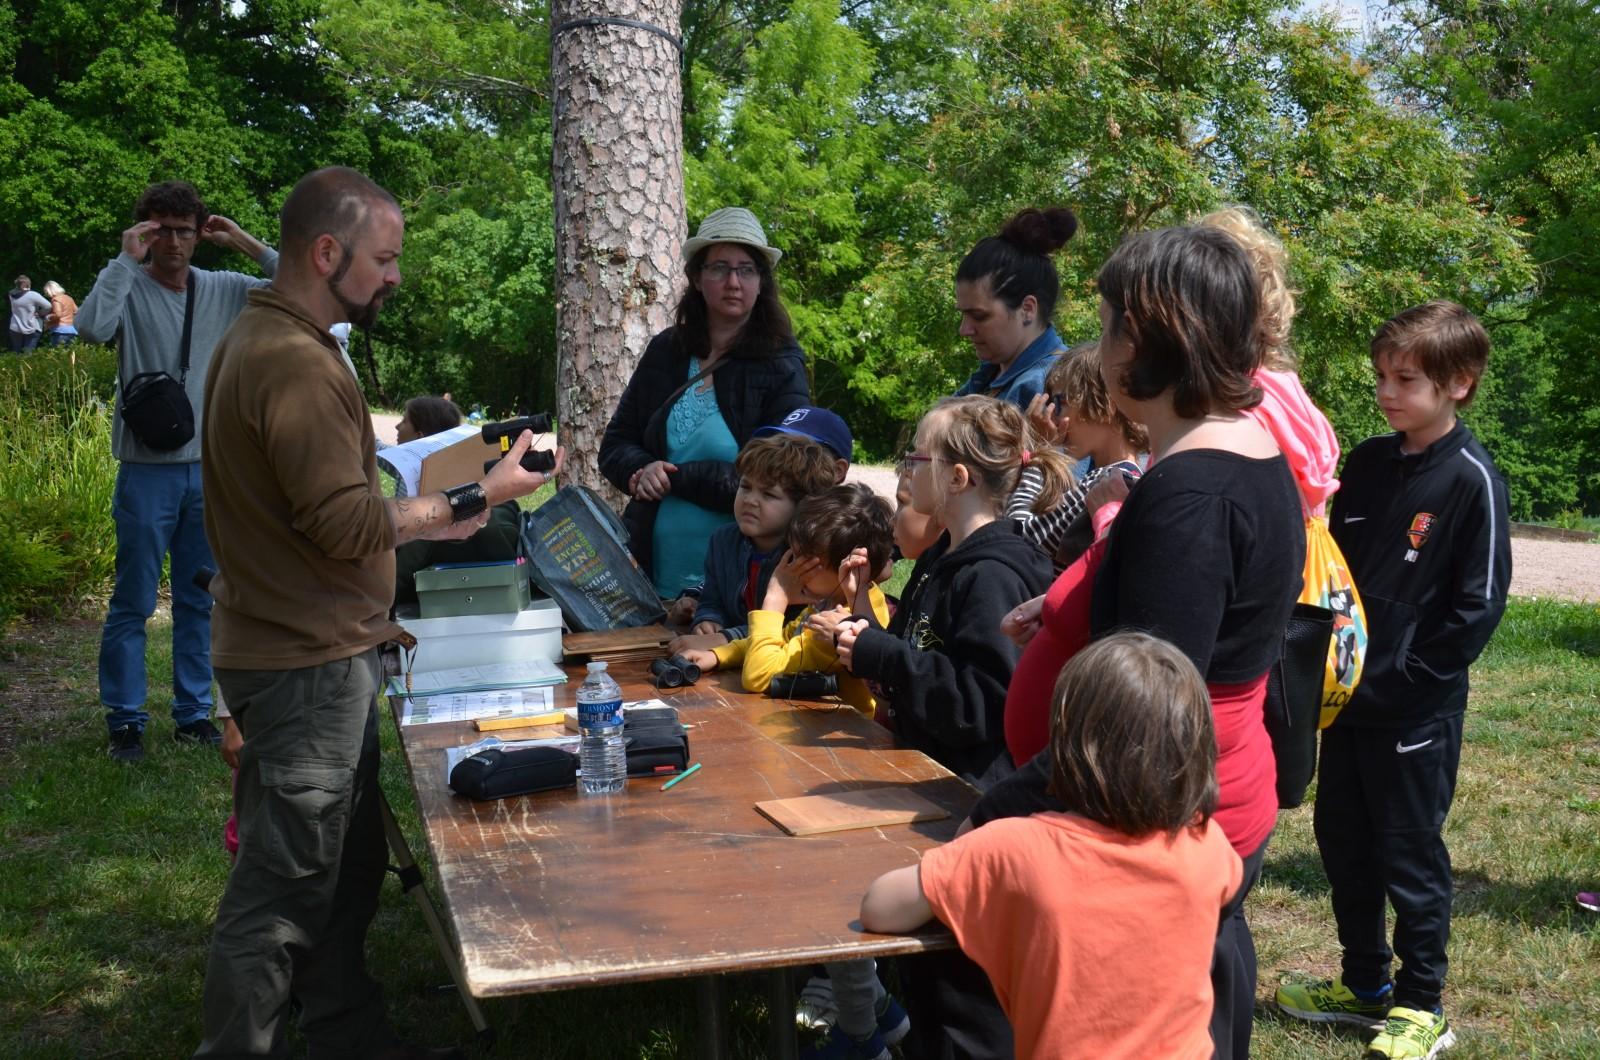 fête de la nature 2019 Bellerive atelier